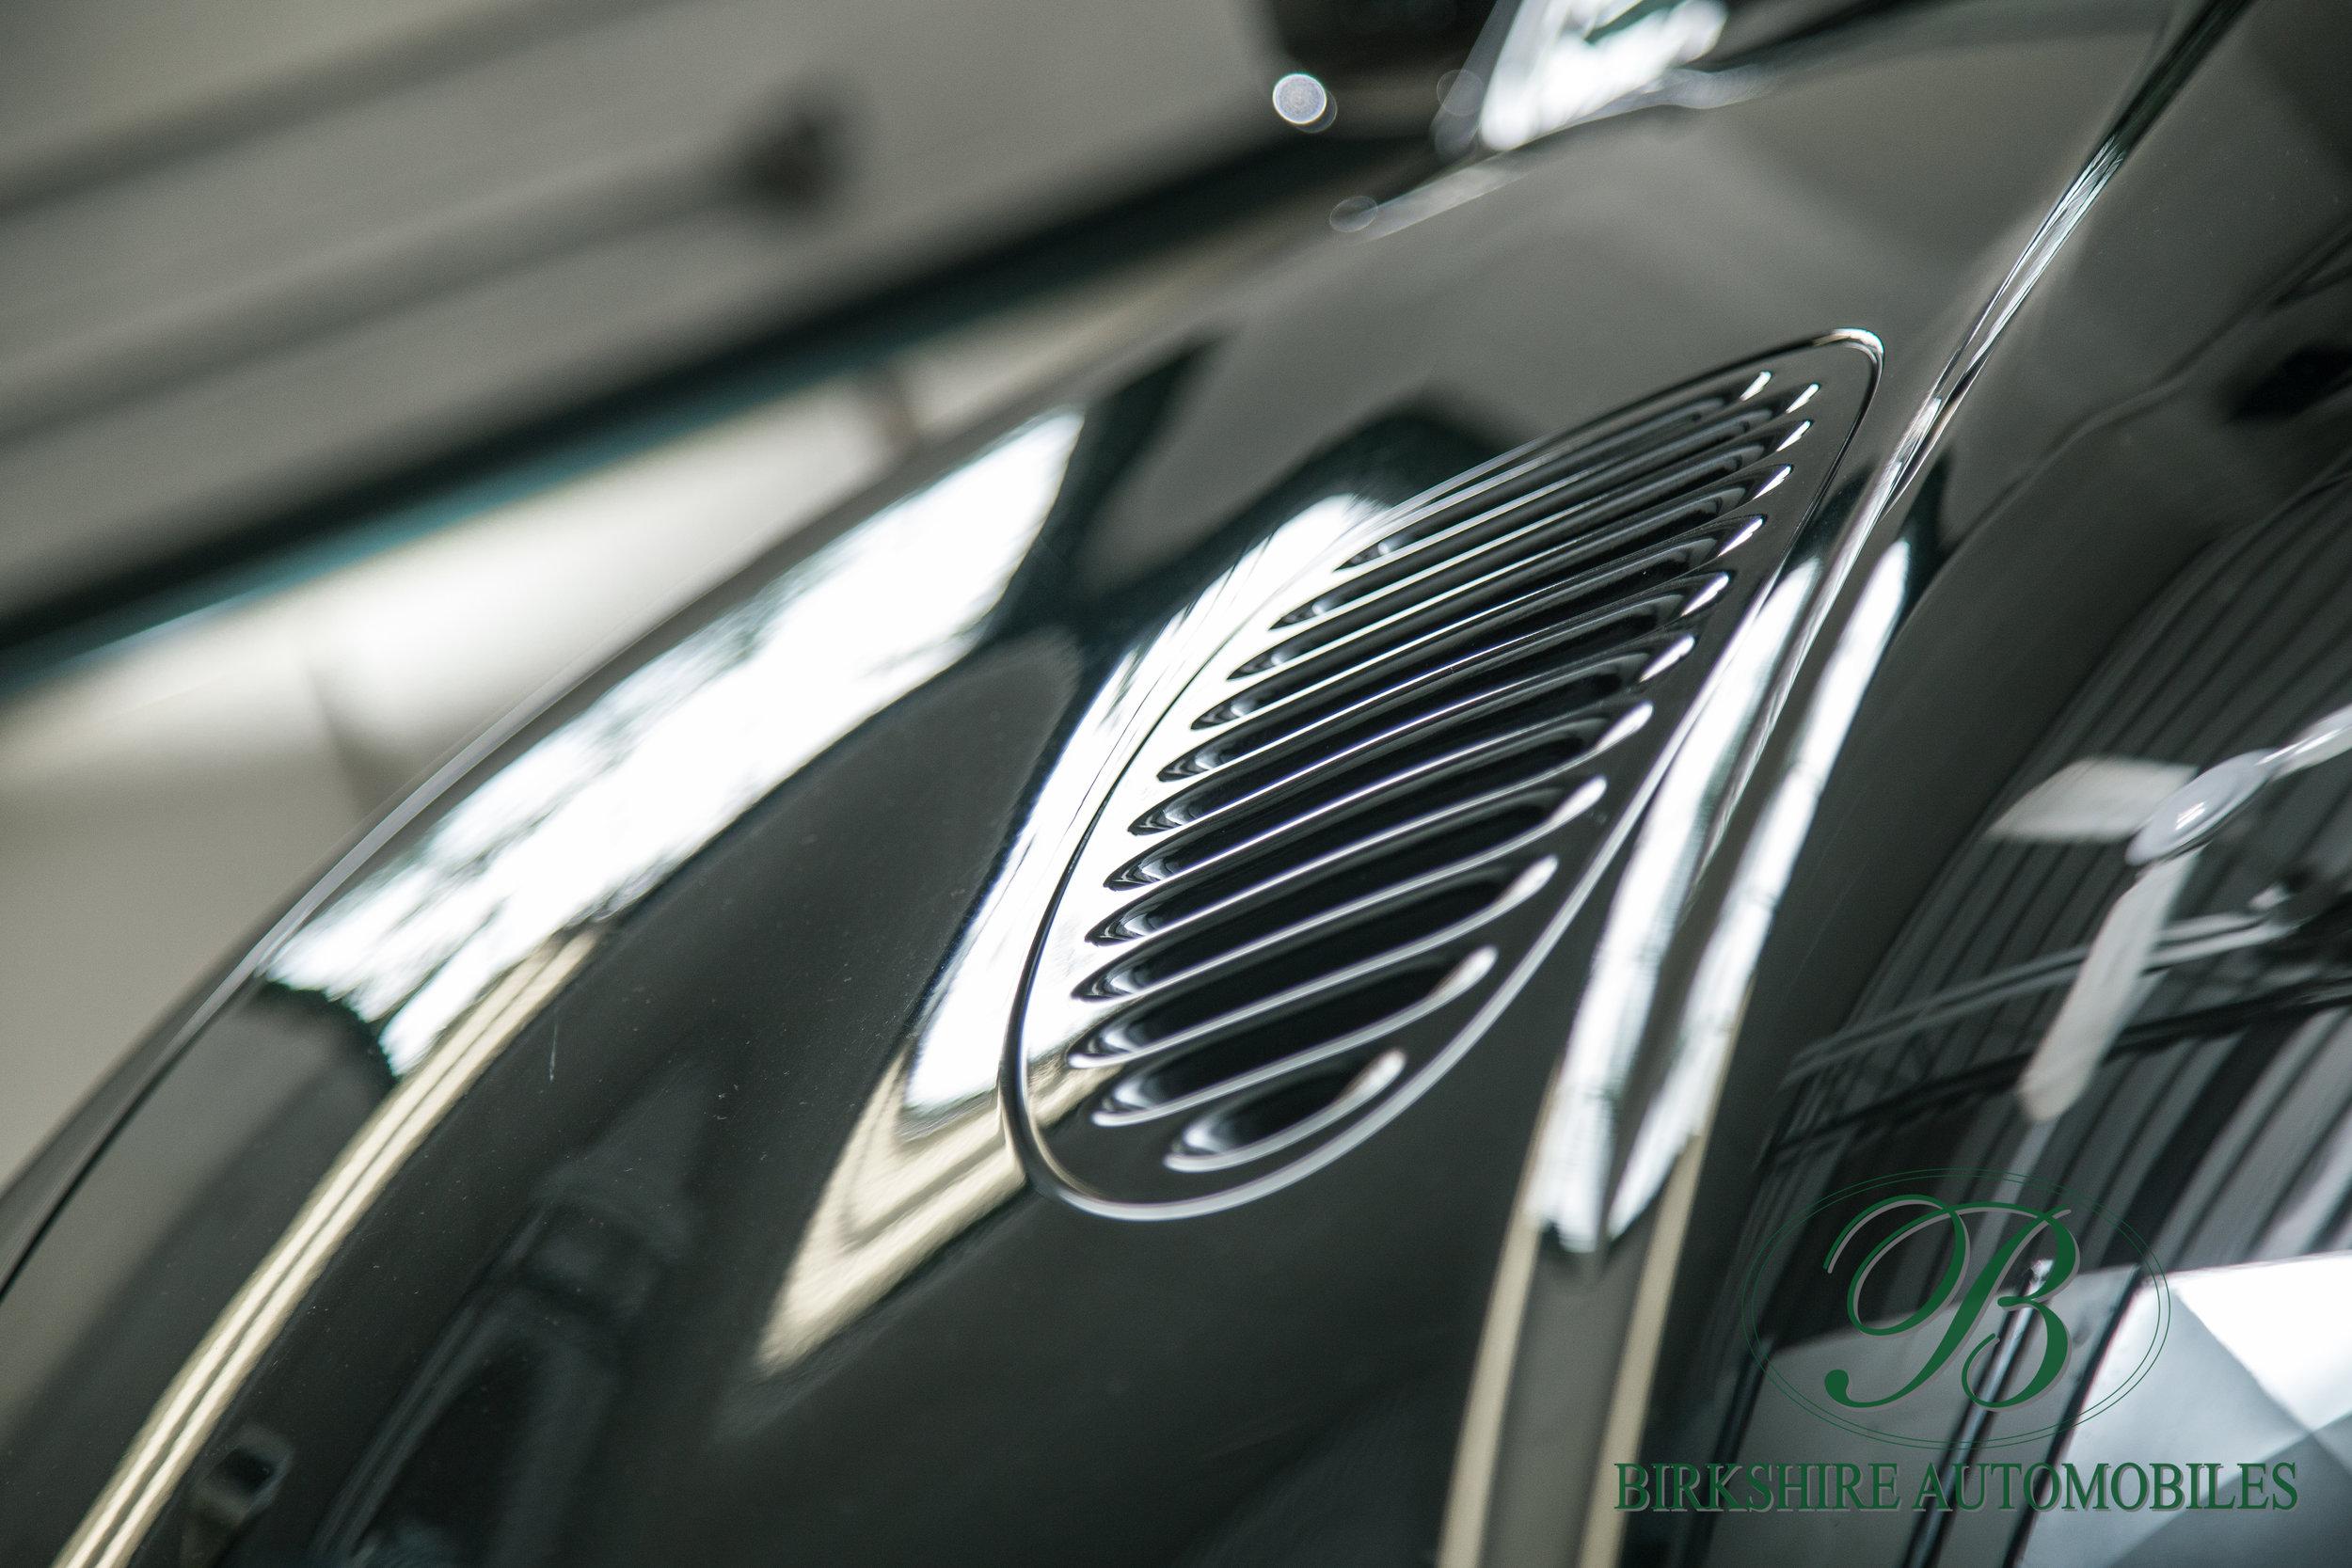 Birkshire Automobiles-115.jpg